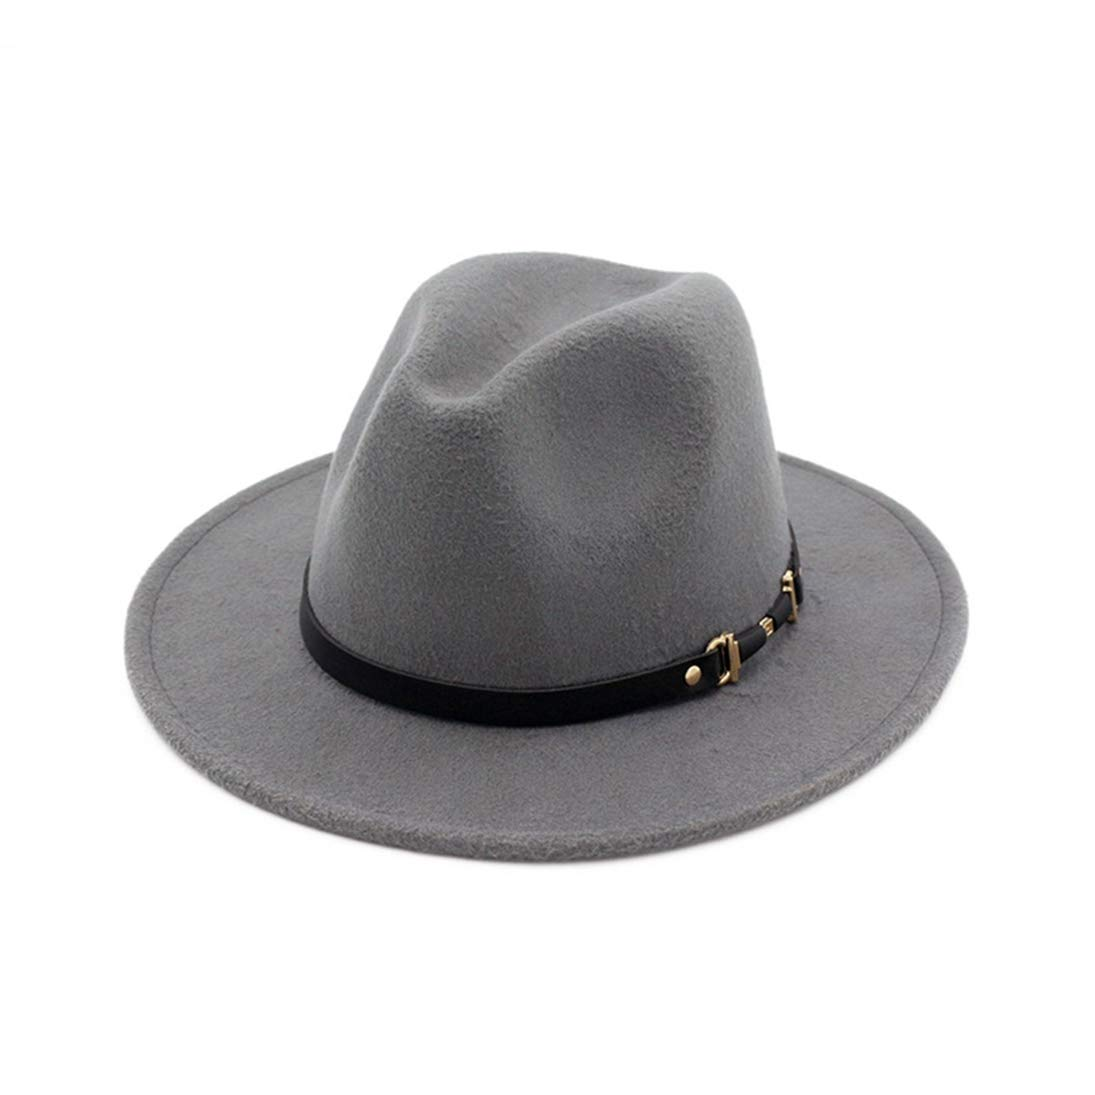 Mens Woolen Wide Brim Fedora Hats Warm Classic Vintage Trilby Hat Jazz Cap with Black Leather Belt